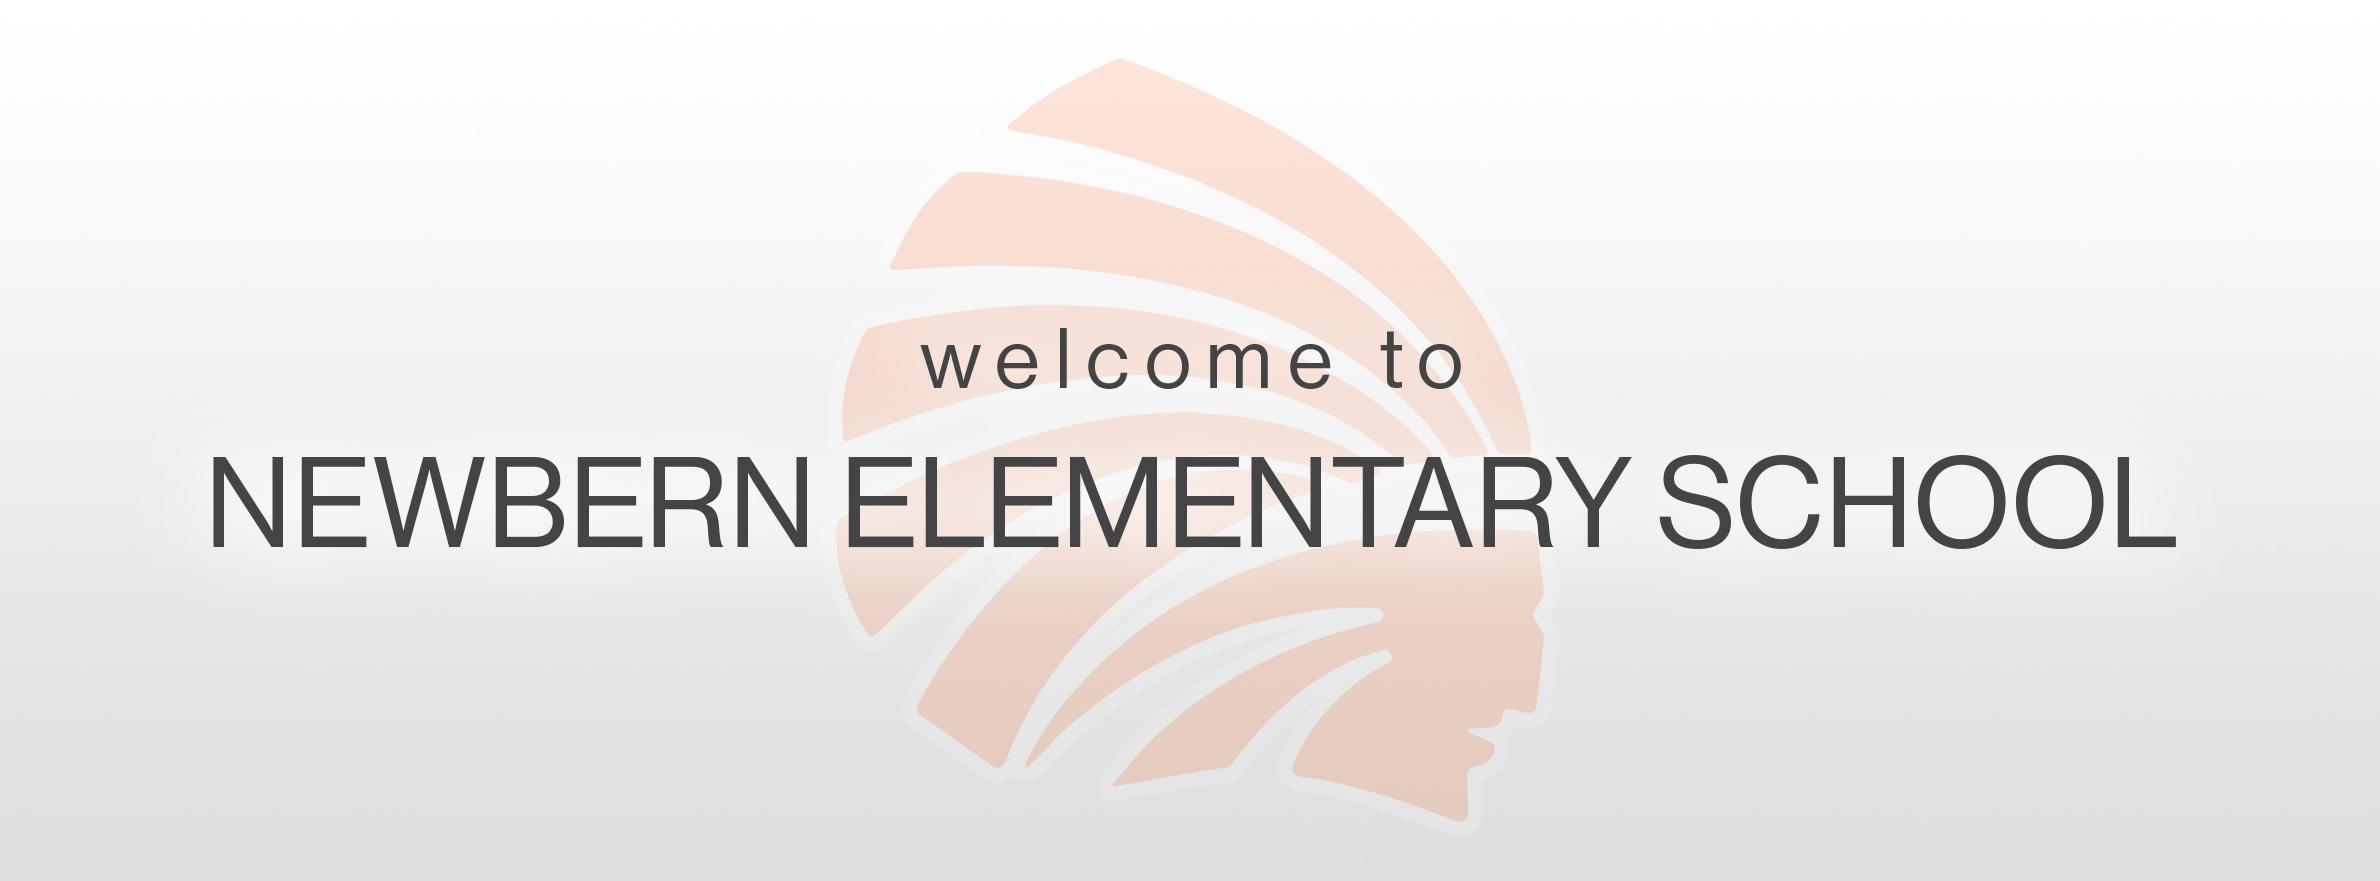 Newbern Elementary